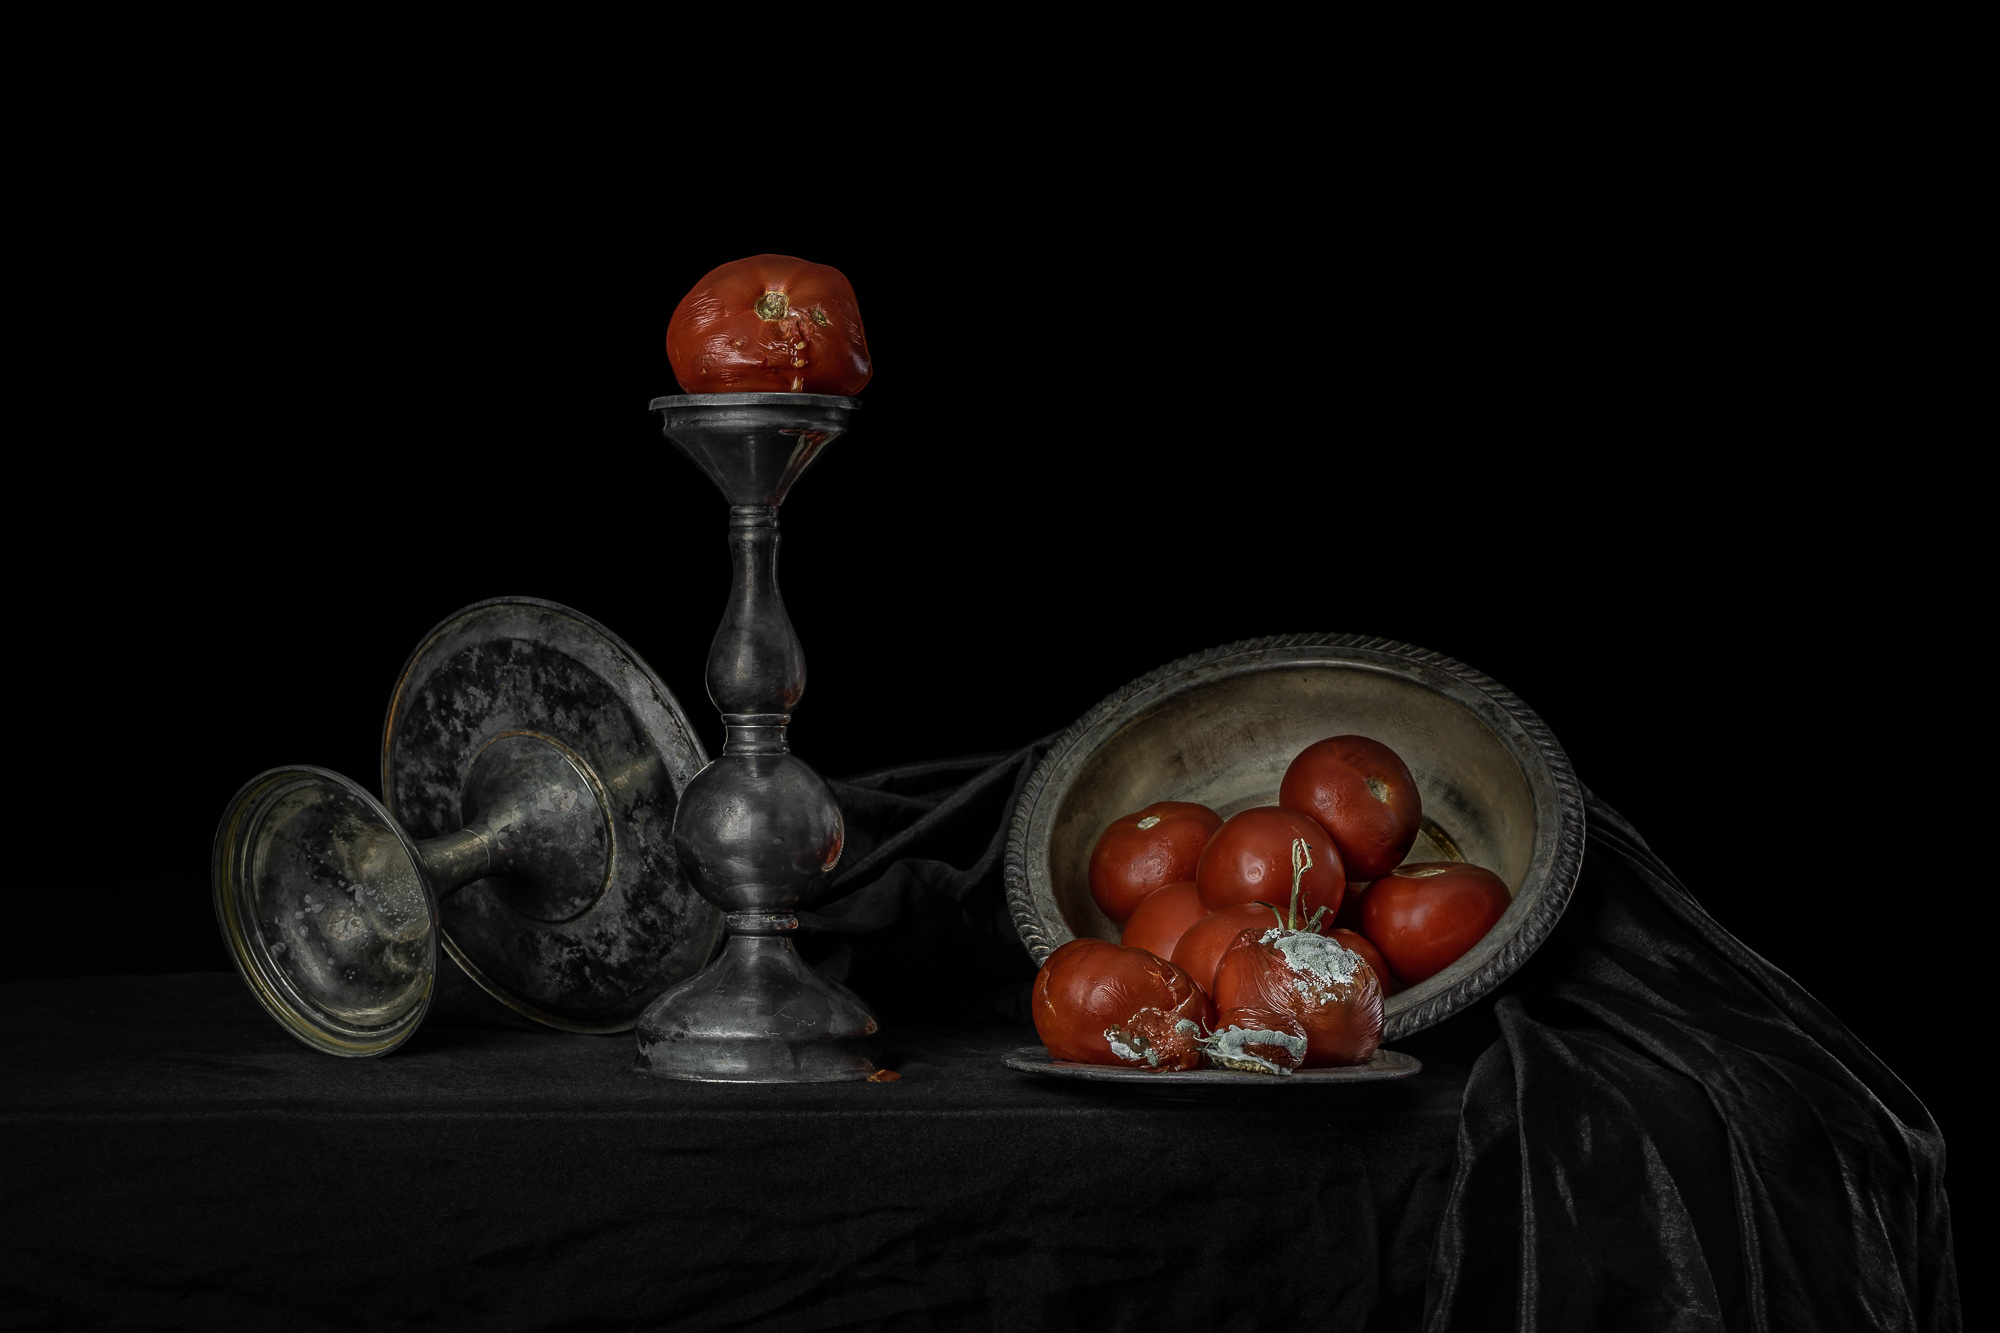 neal-auch-the-last-supper-of-mohammed-ajmal-amir-kasab.jpg